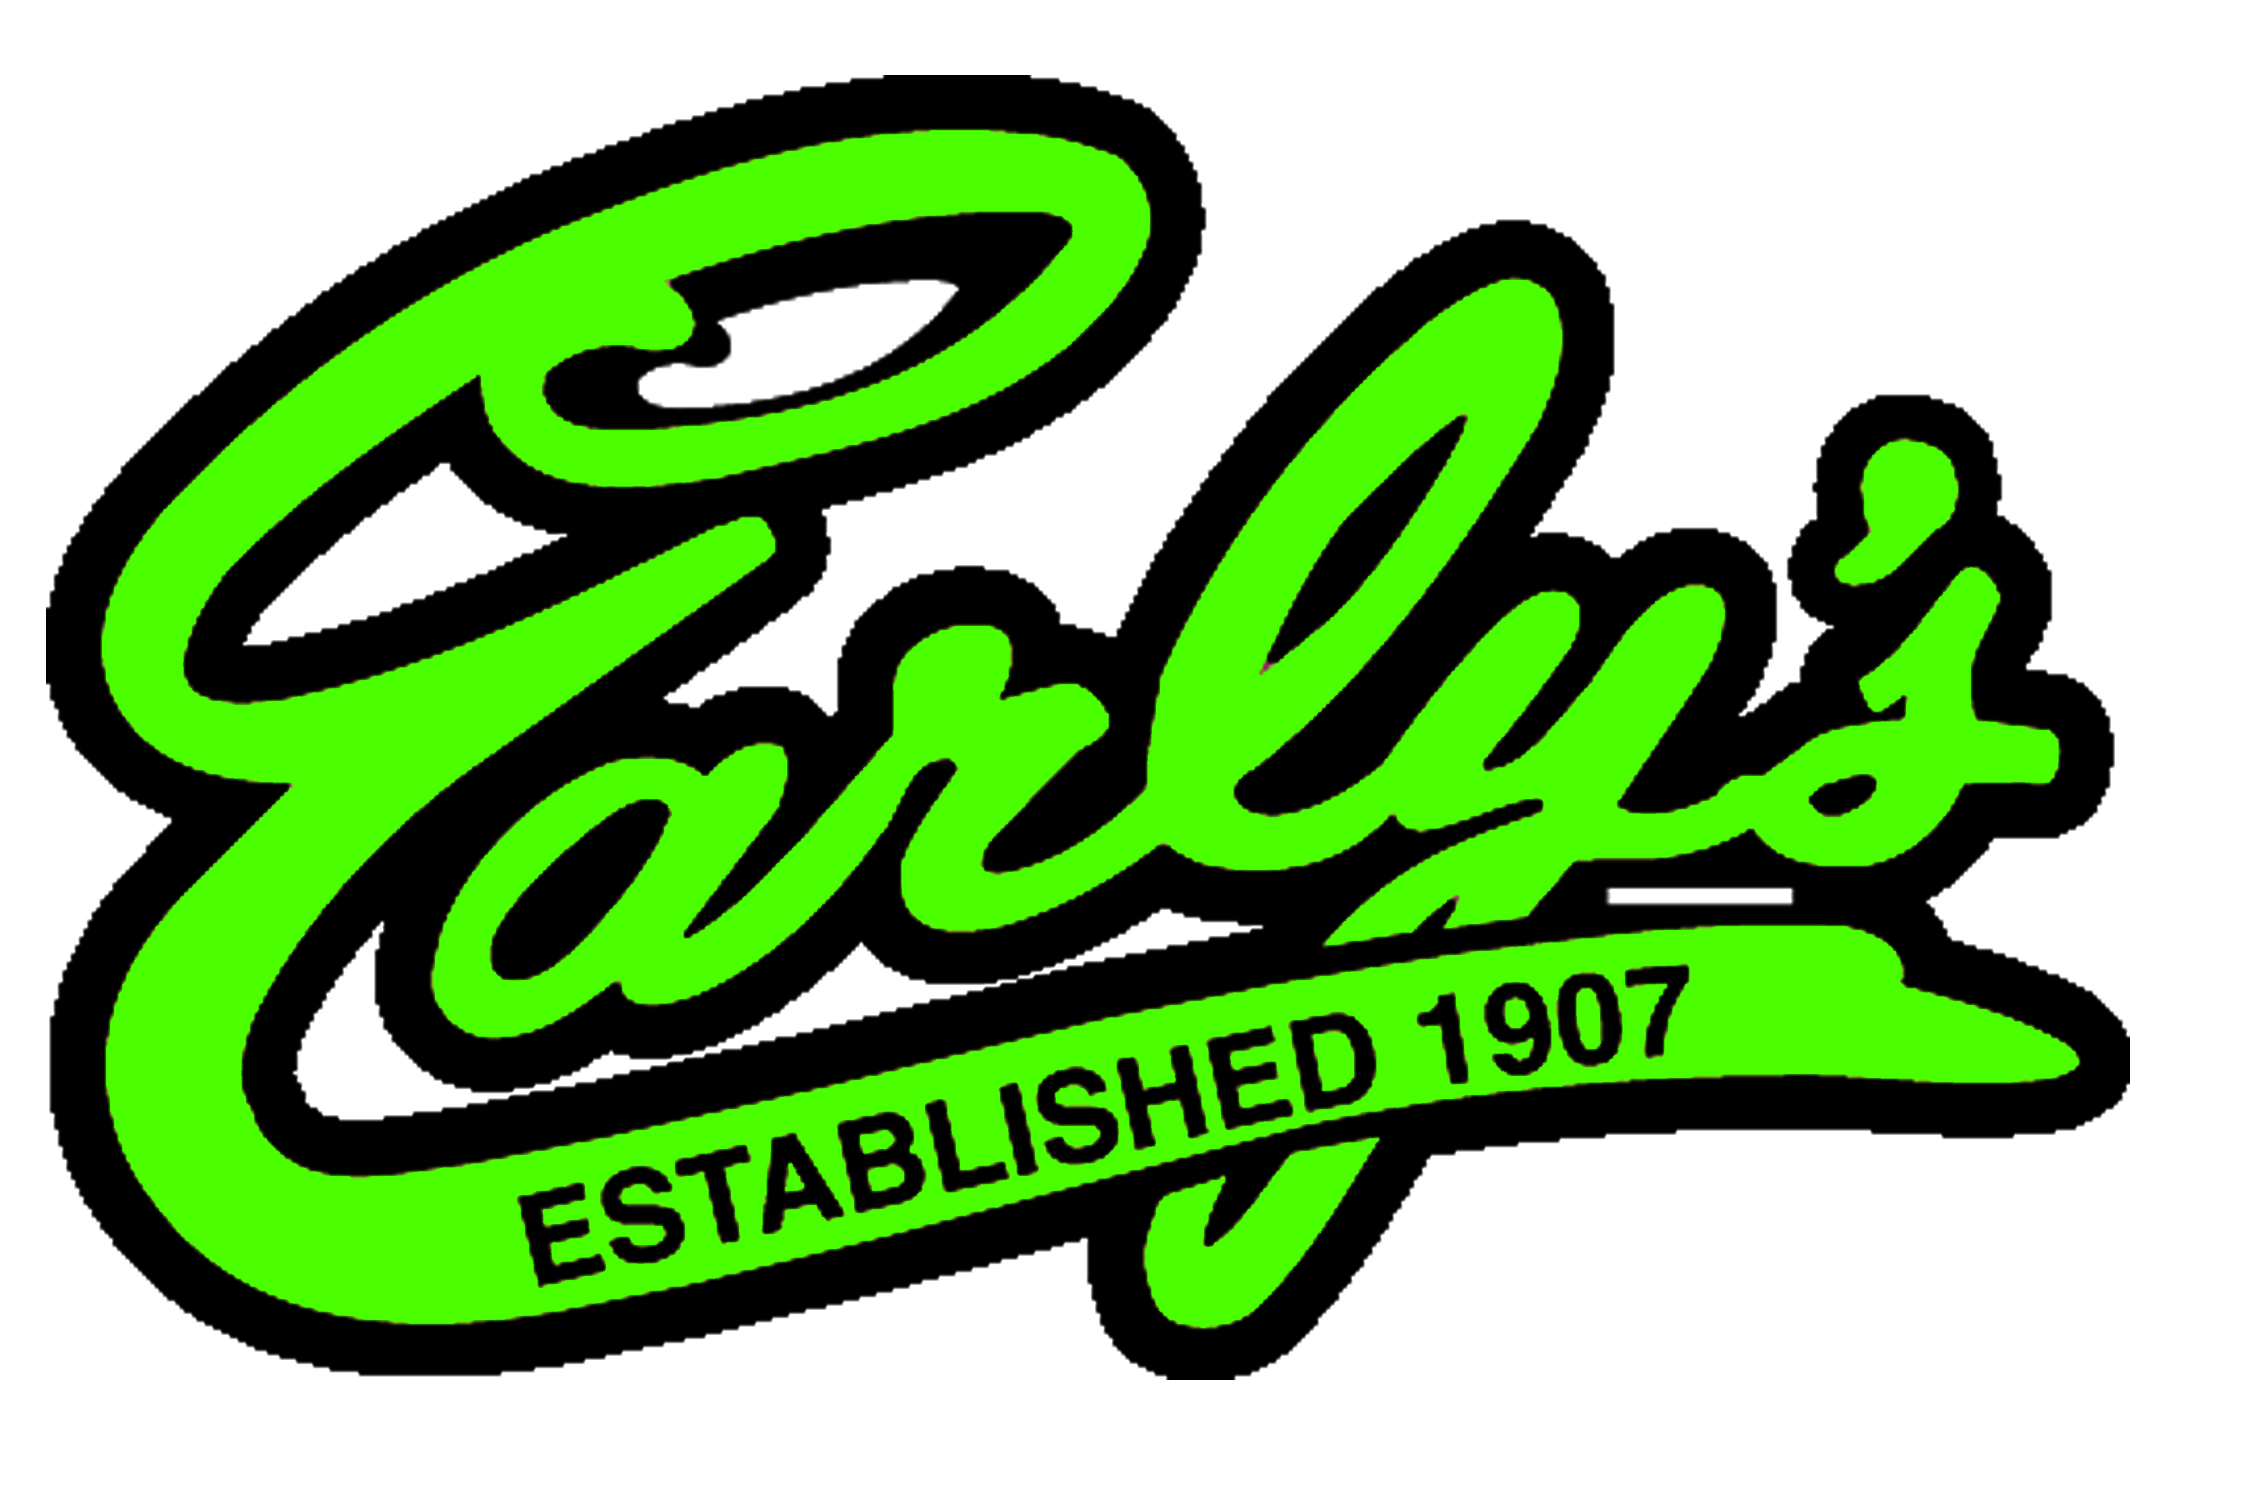 Early's logo illus2_green_lg.jpg